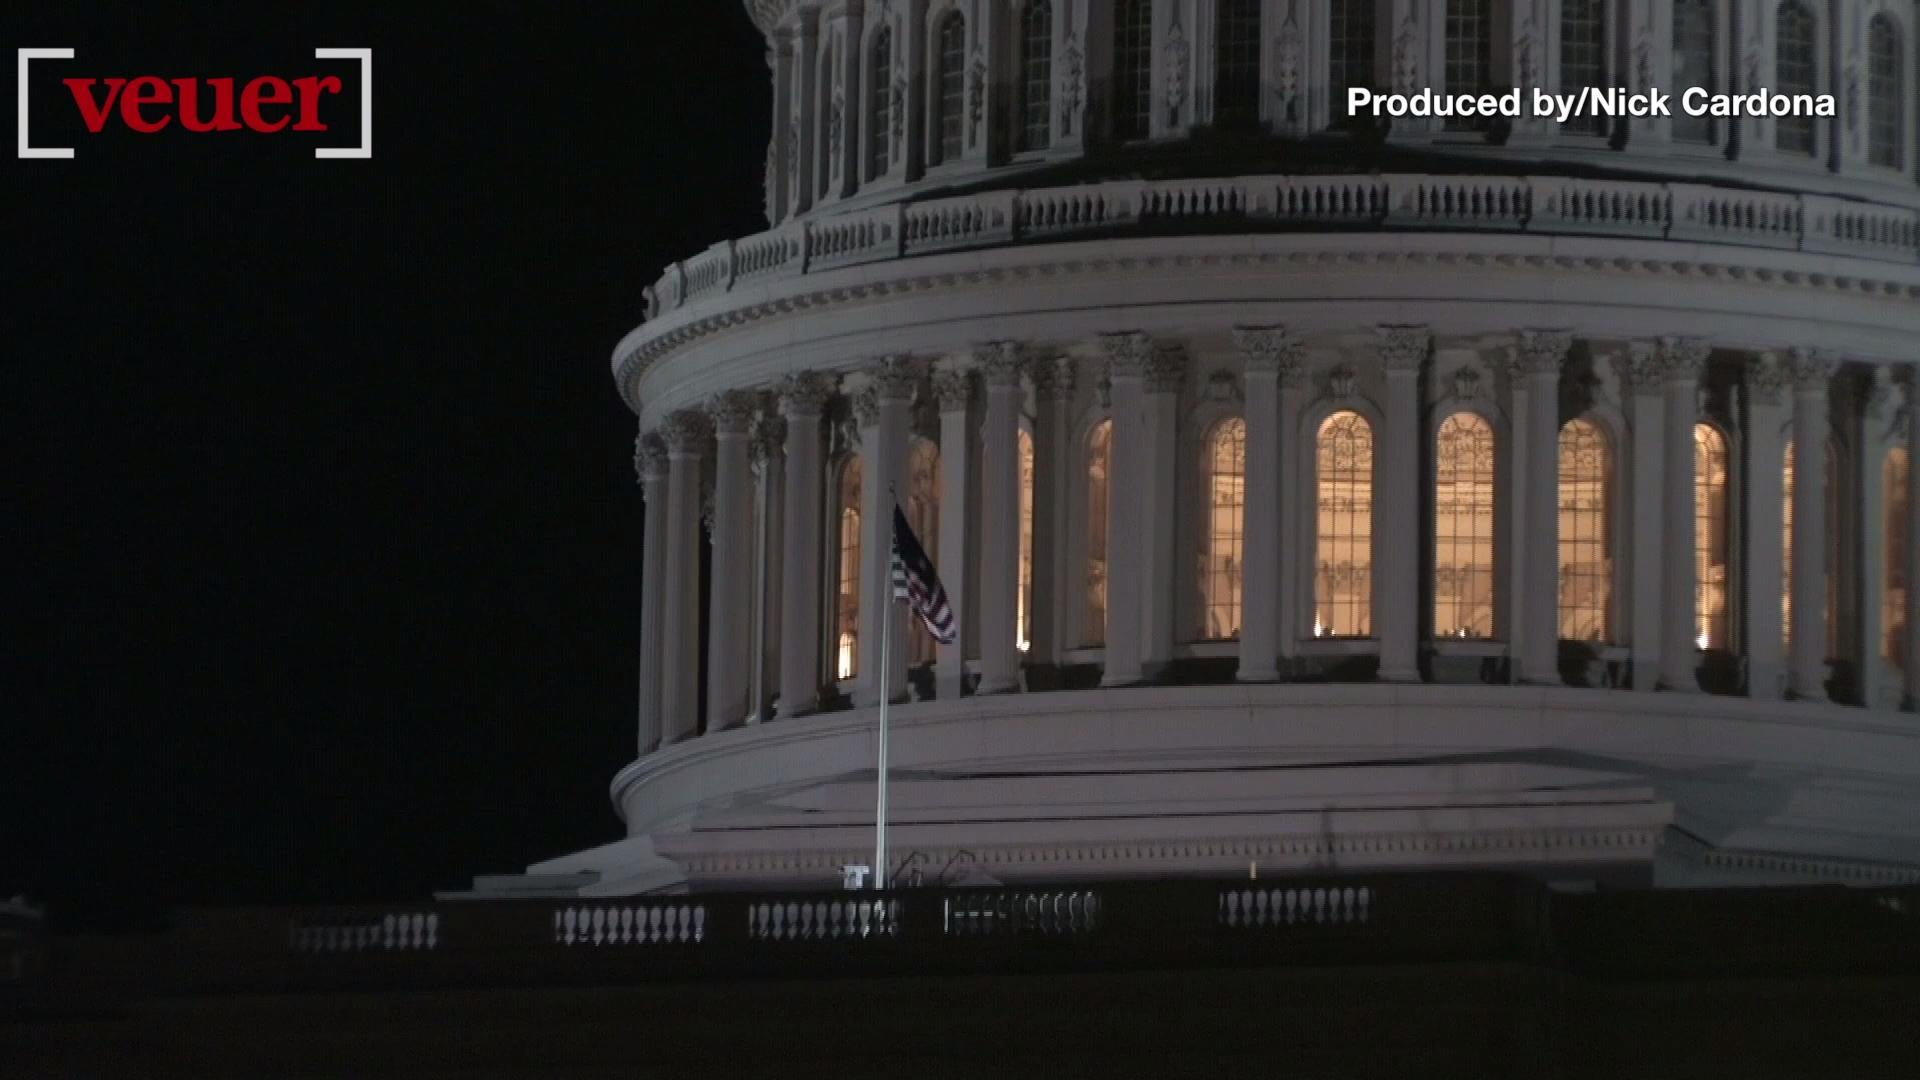 Congressman Takes First Formal Step To Impeach Trump